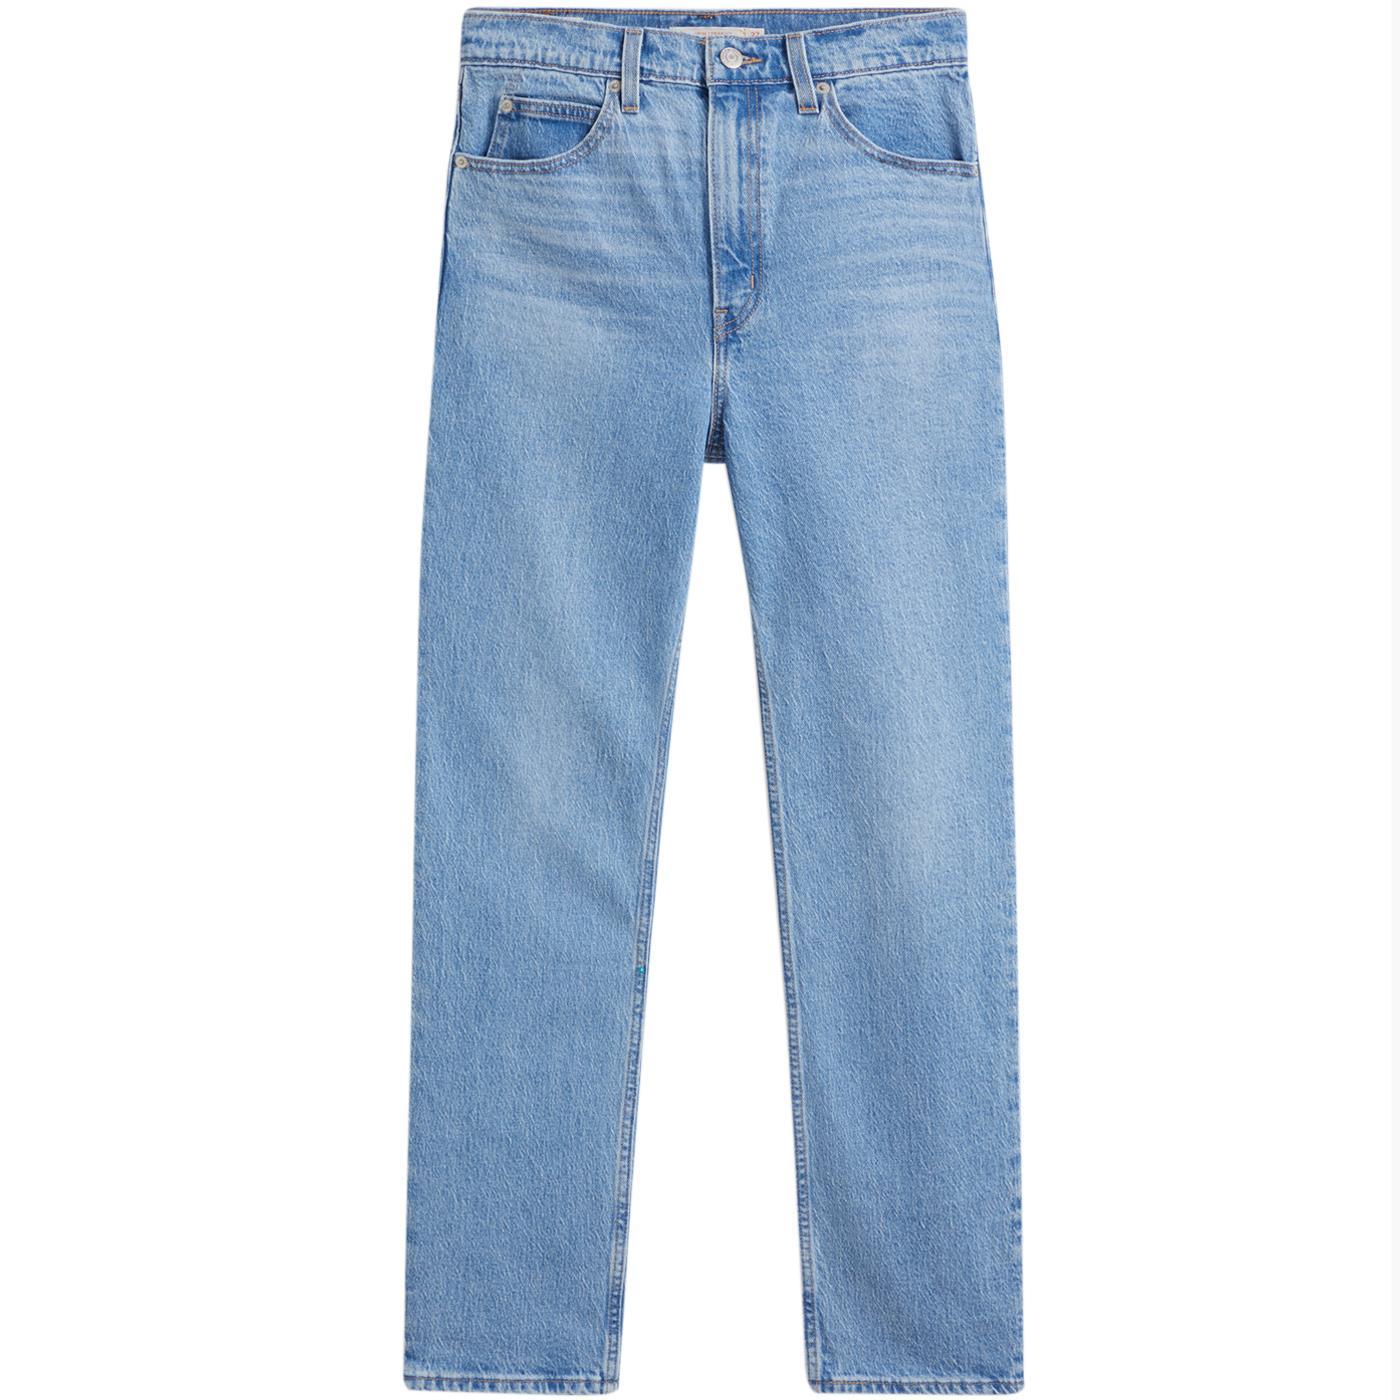 LEVI'S 70s High Slim Straight Jeans (Marin Park)